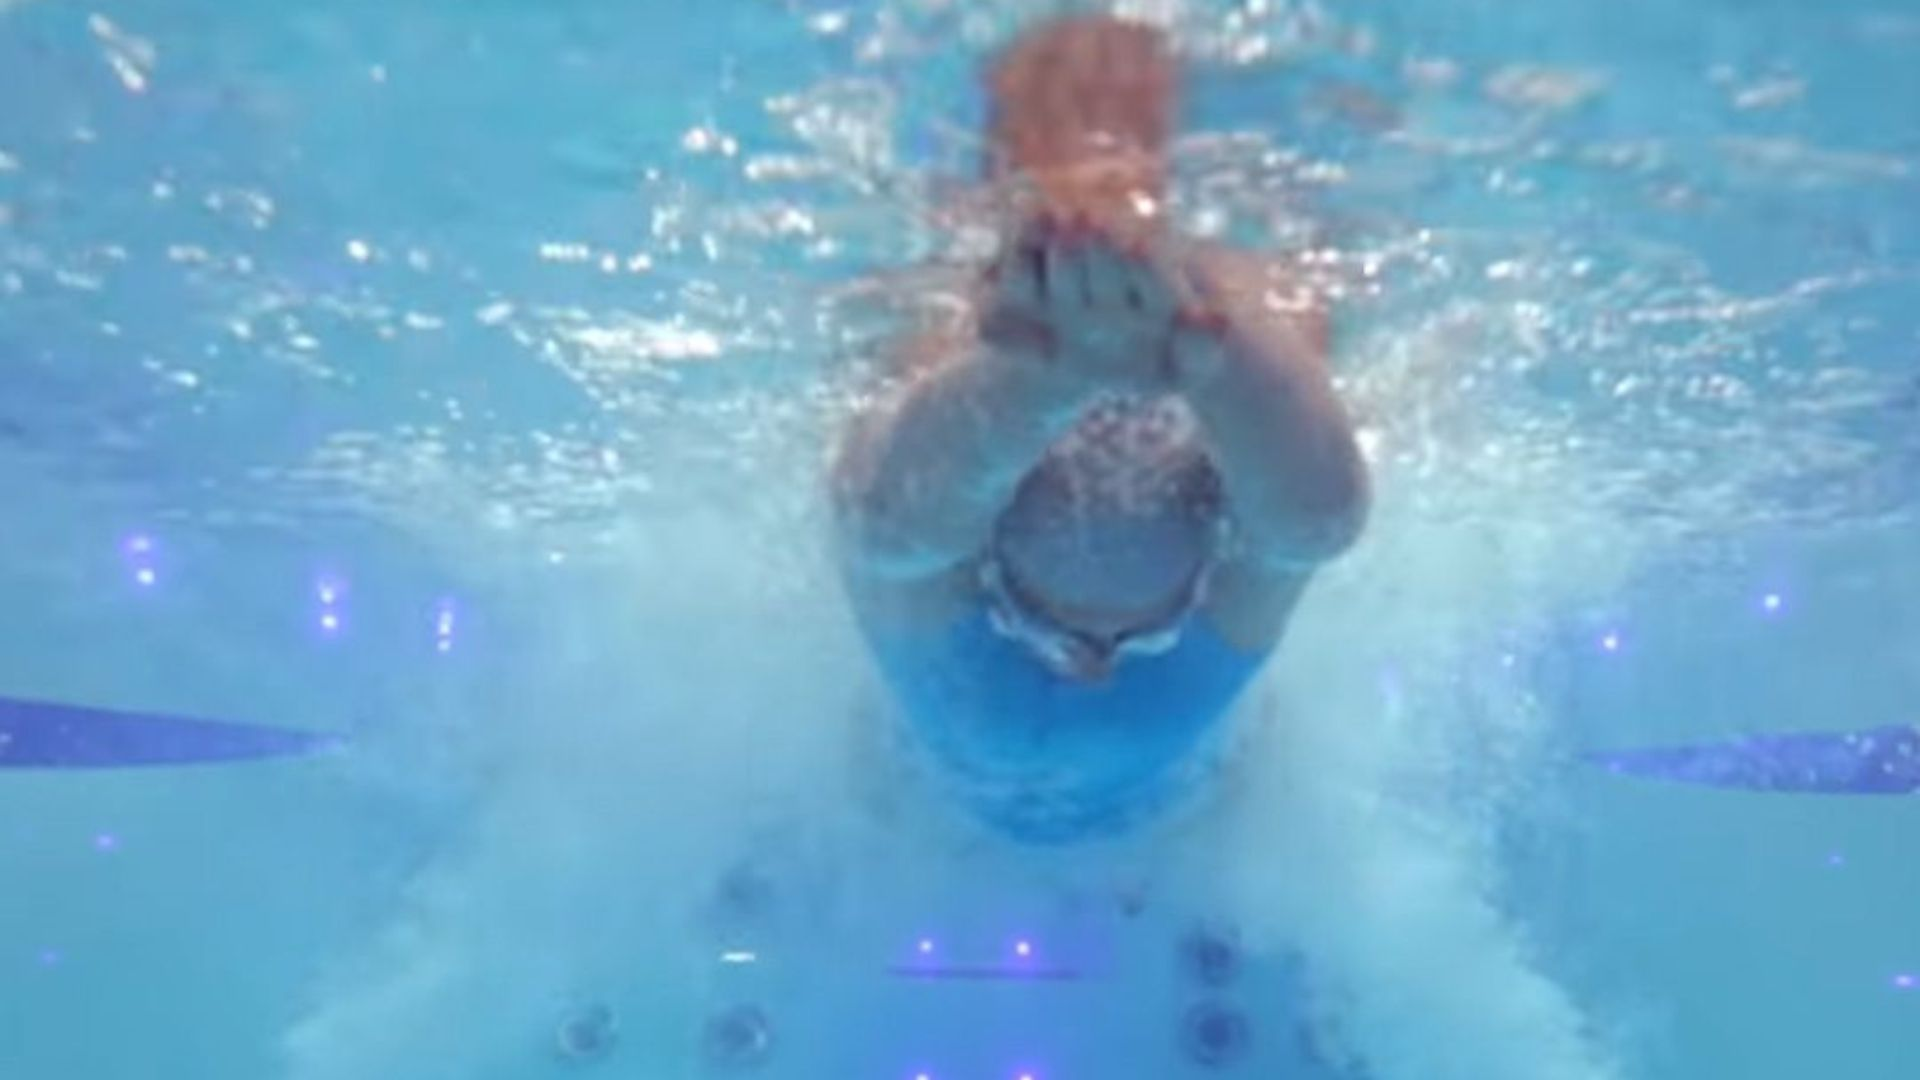 swim spa in winter